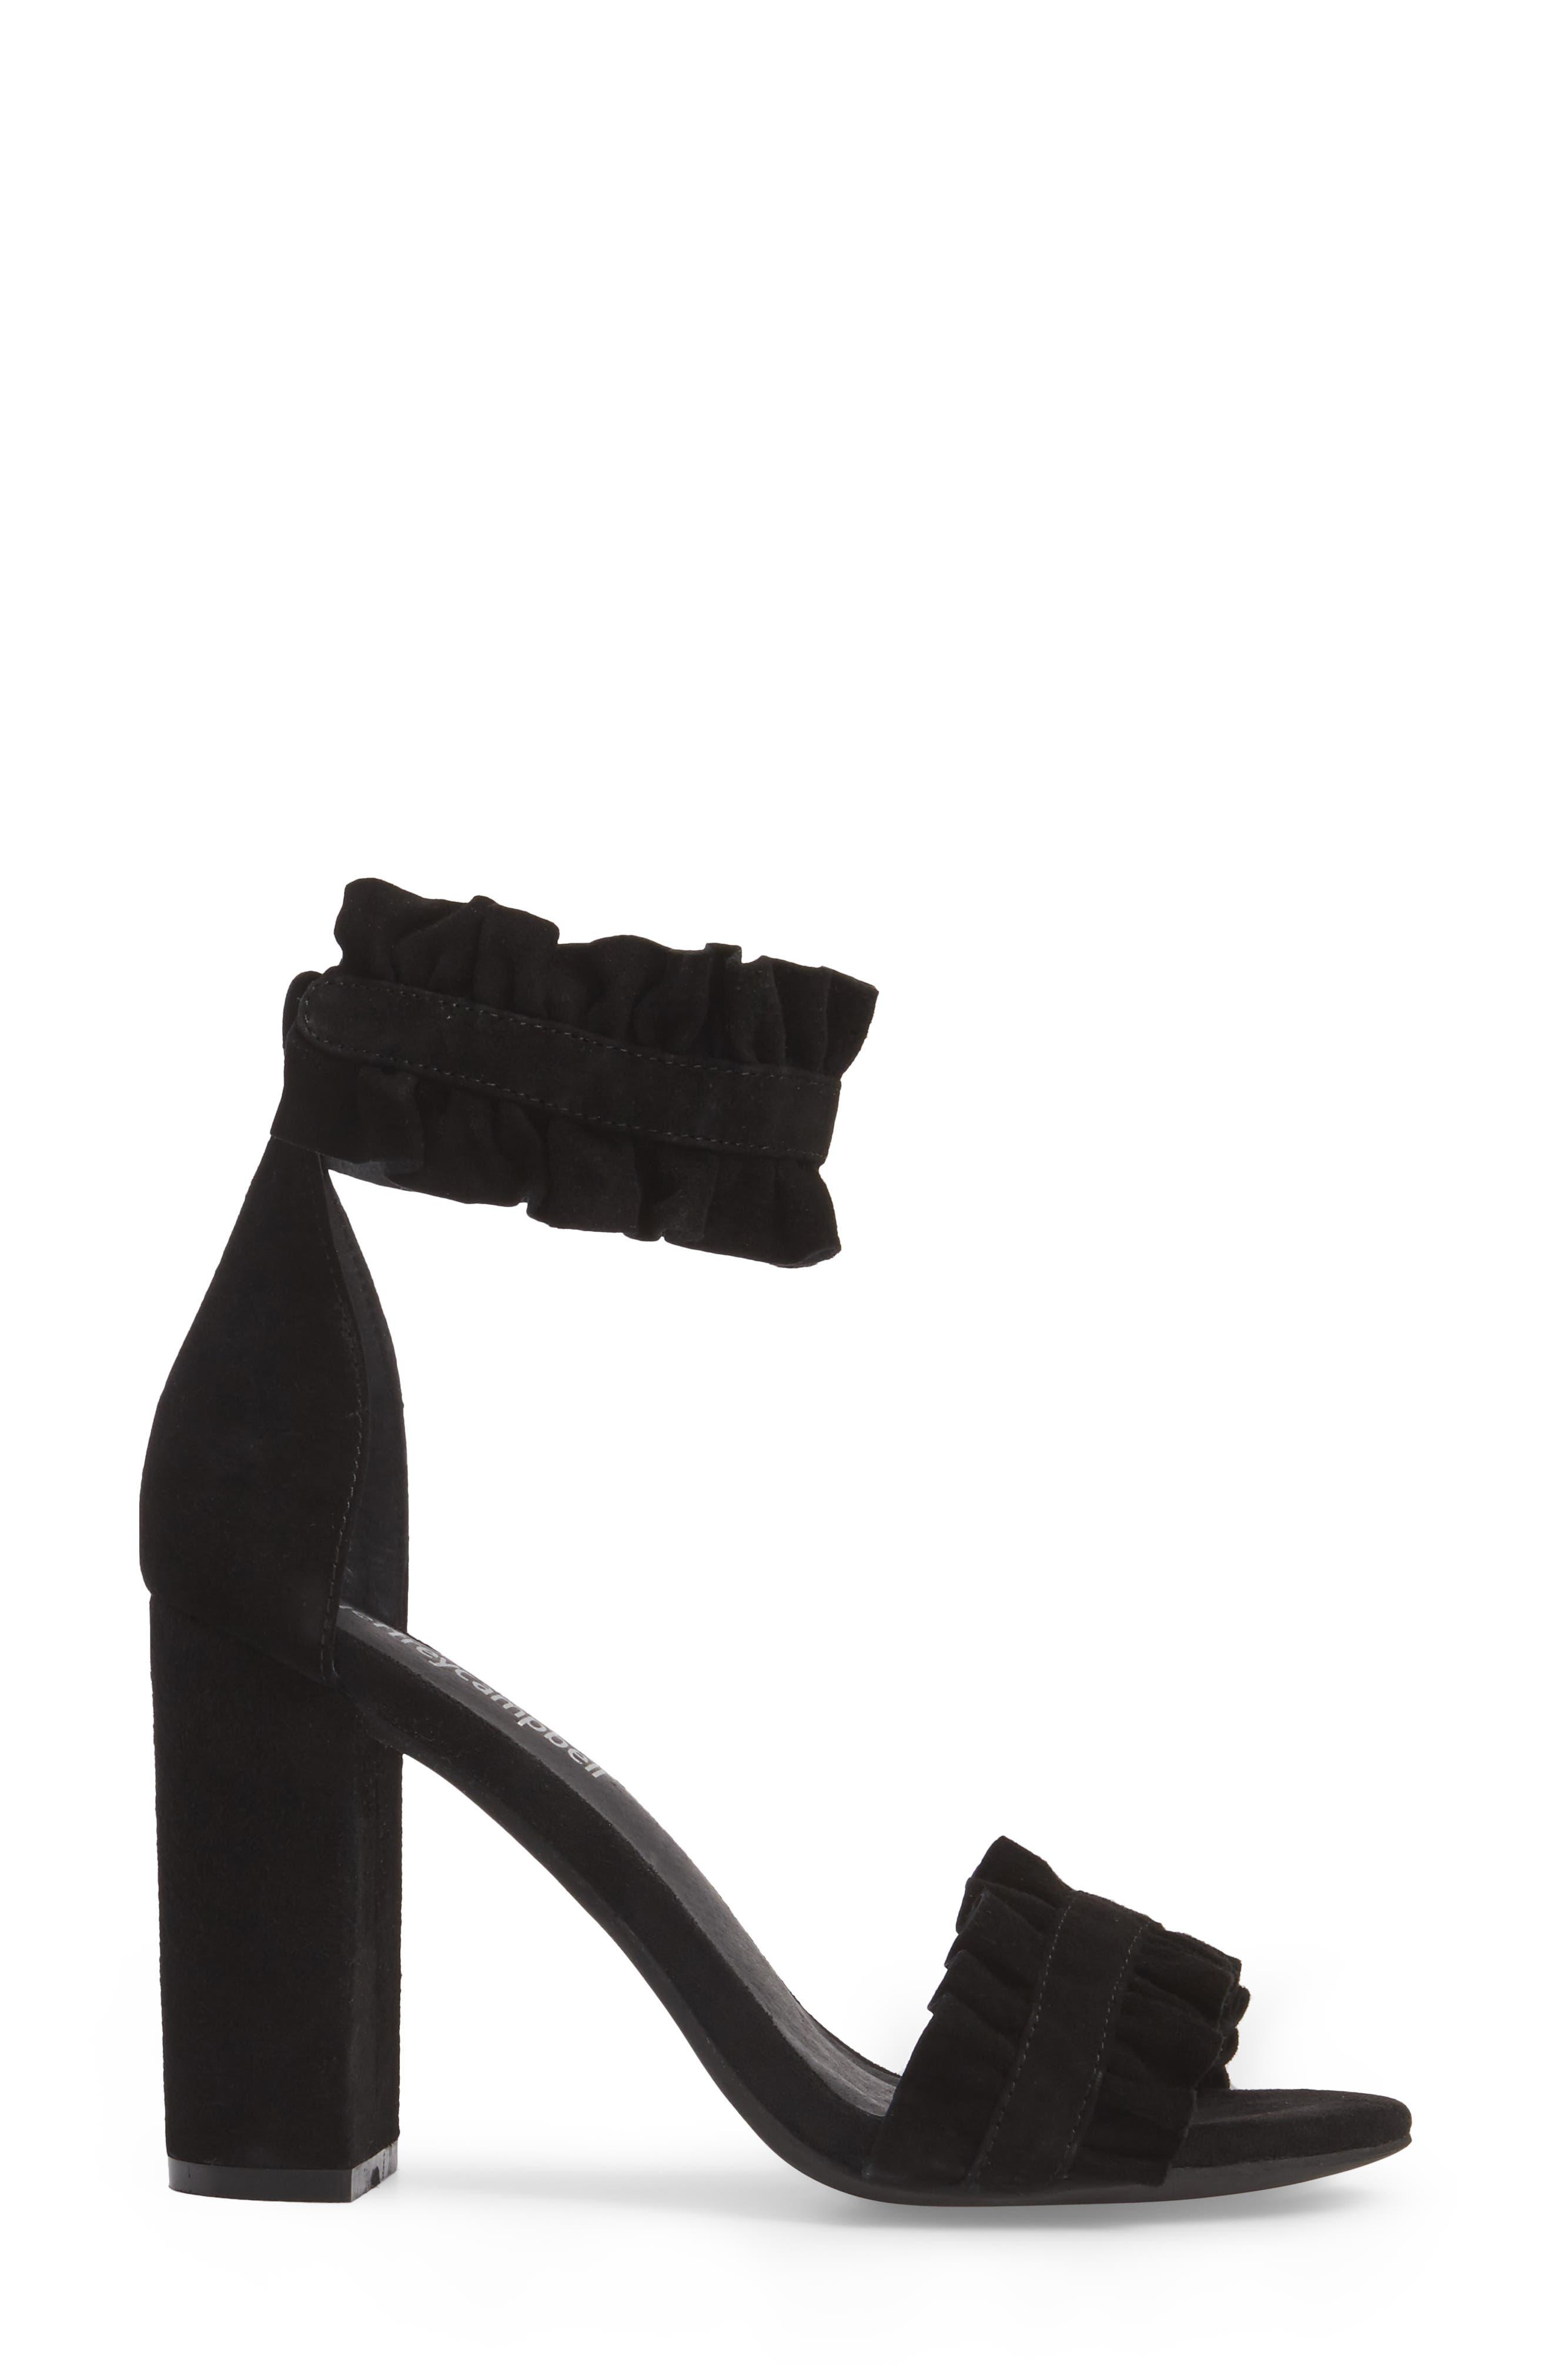 Lindsay Dome Studded Sandal,                             Alternate thumbnail 3, color,                             004